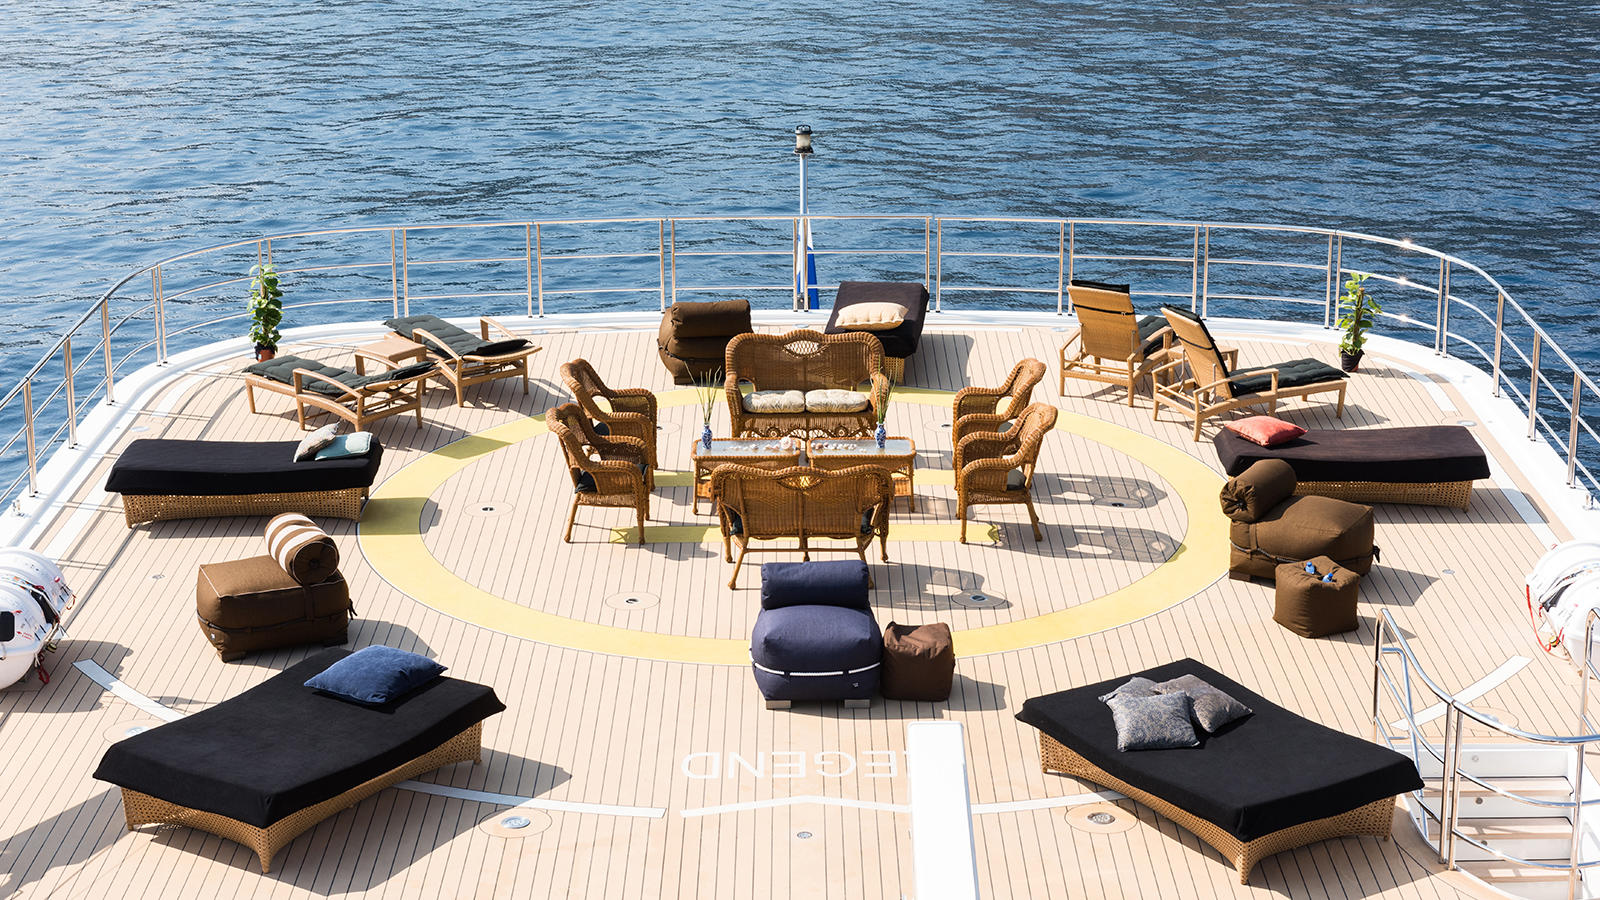 Heli deck - Photo Jeff Brown